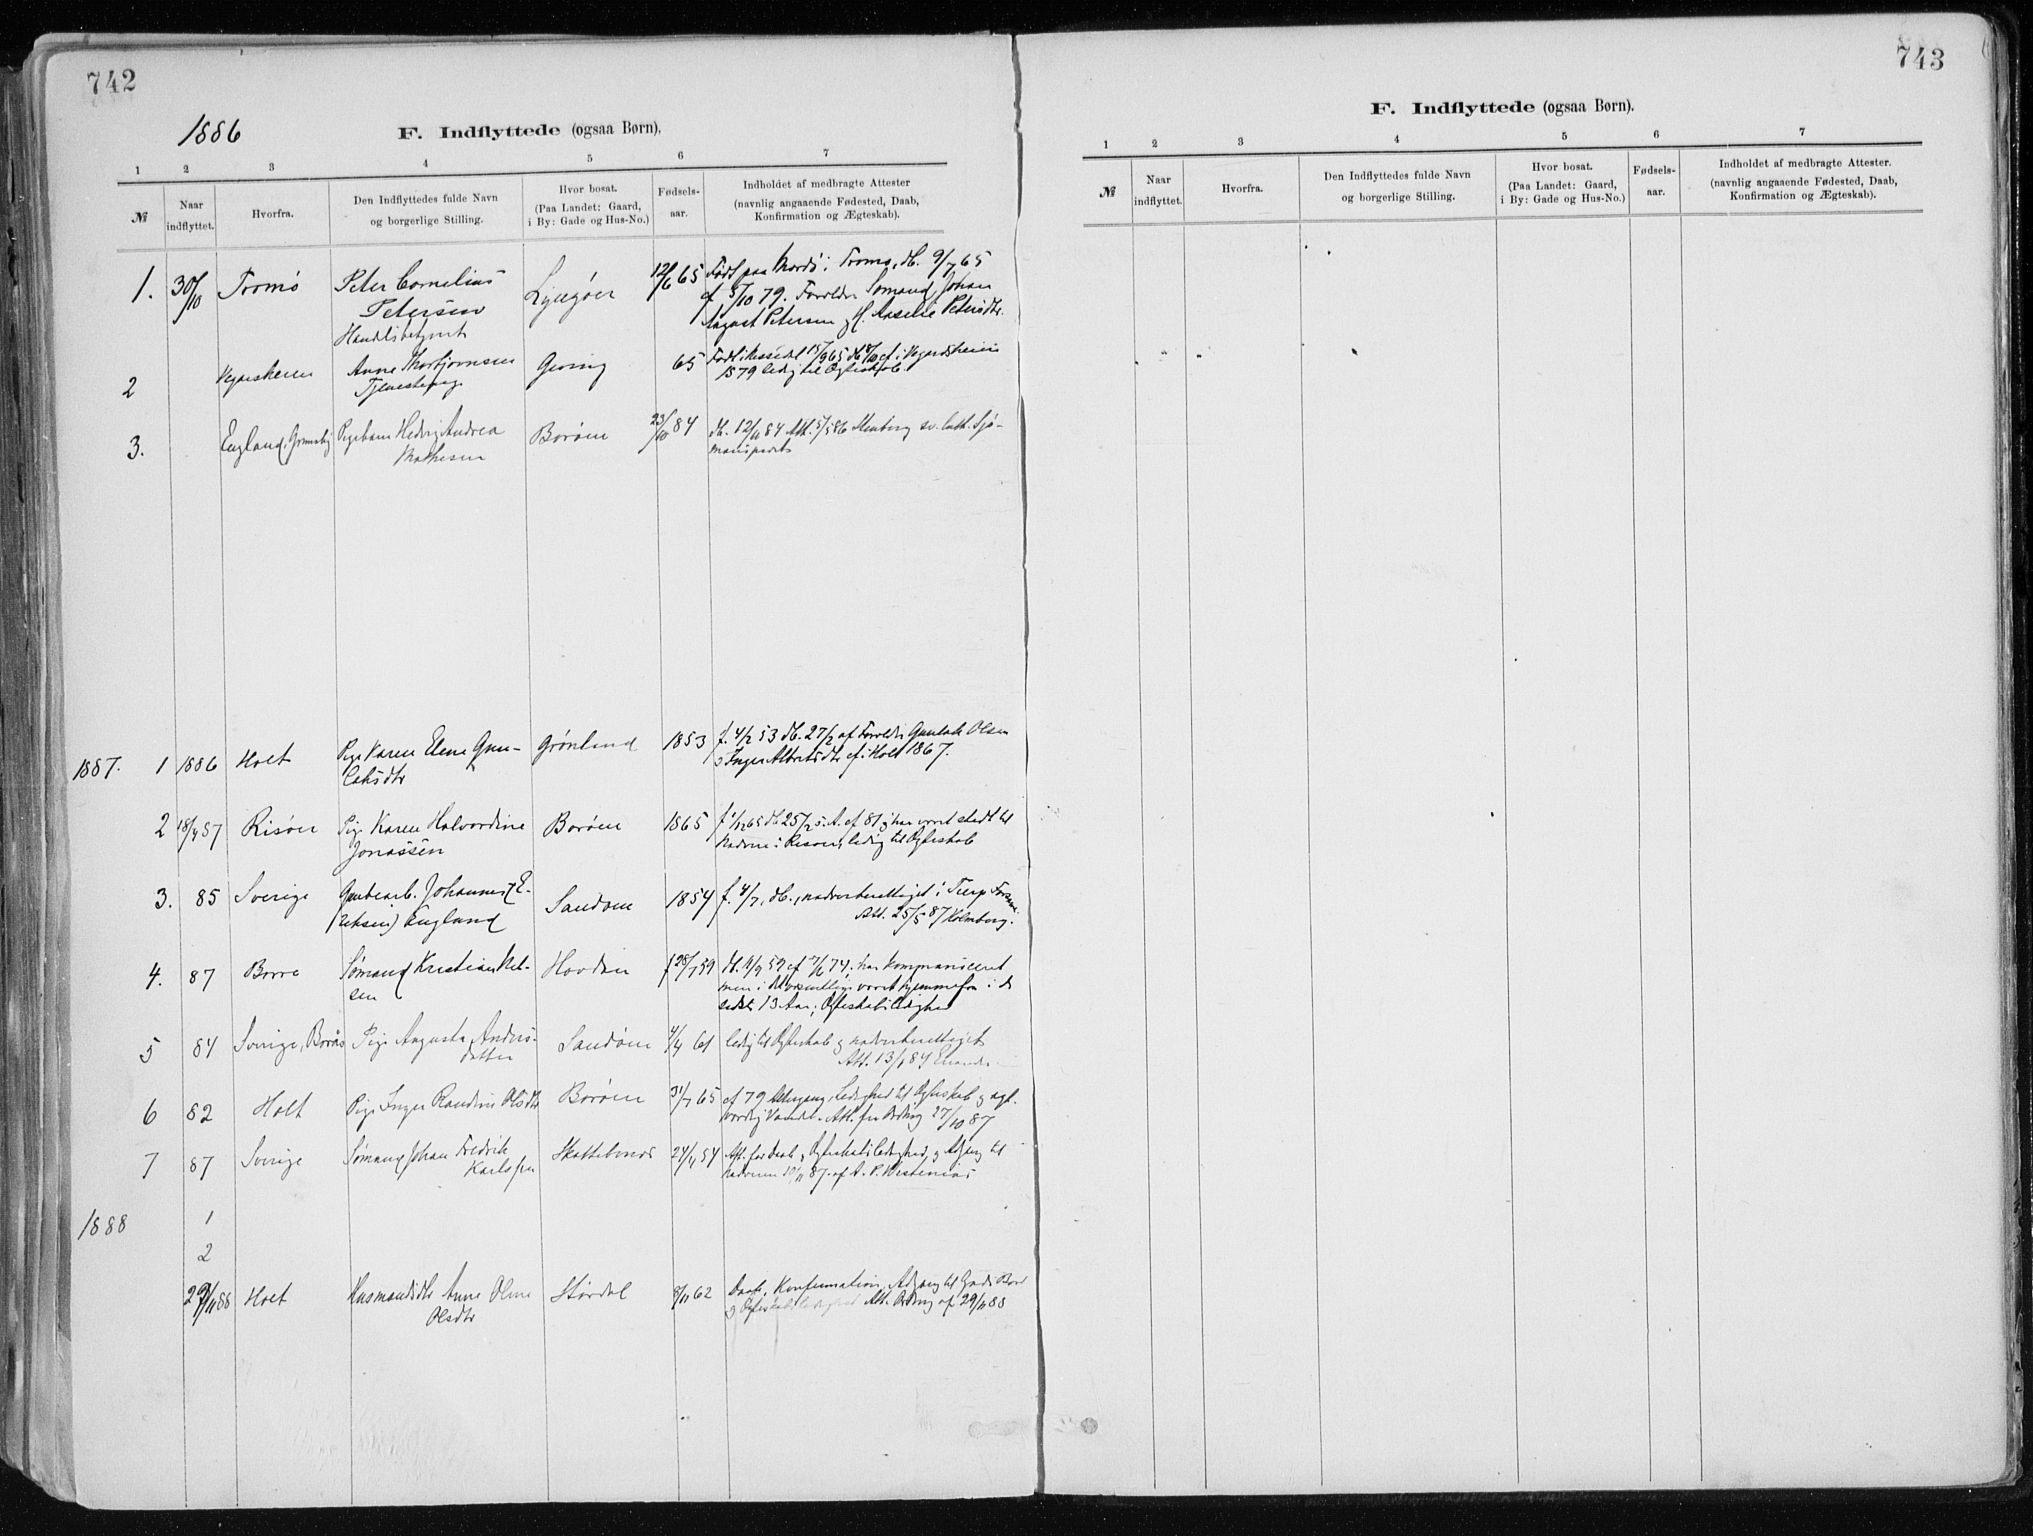 SAK, Dypvåg sokneprestkontor, F/Fa/Faa/L0008: Ministerialbok nr. A 8, 1885-1906, s. 742-743